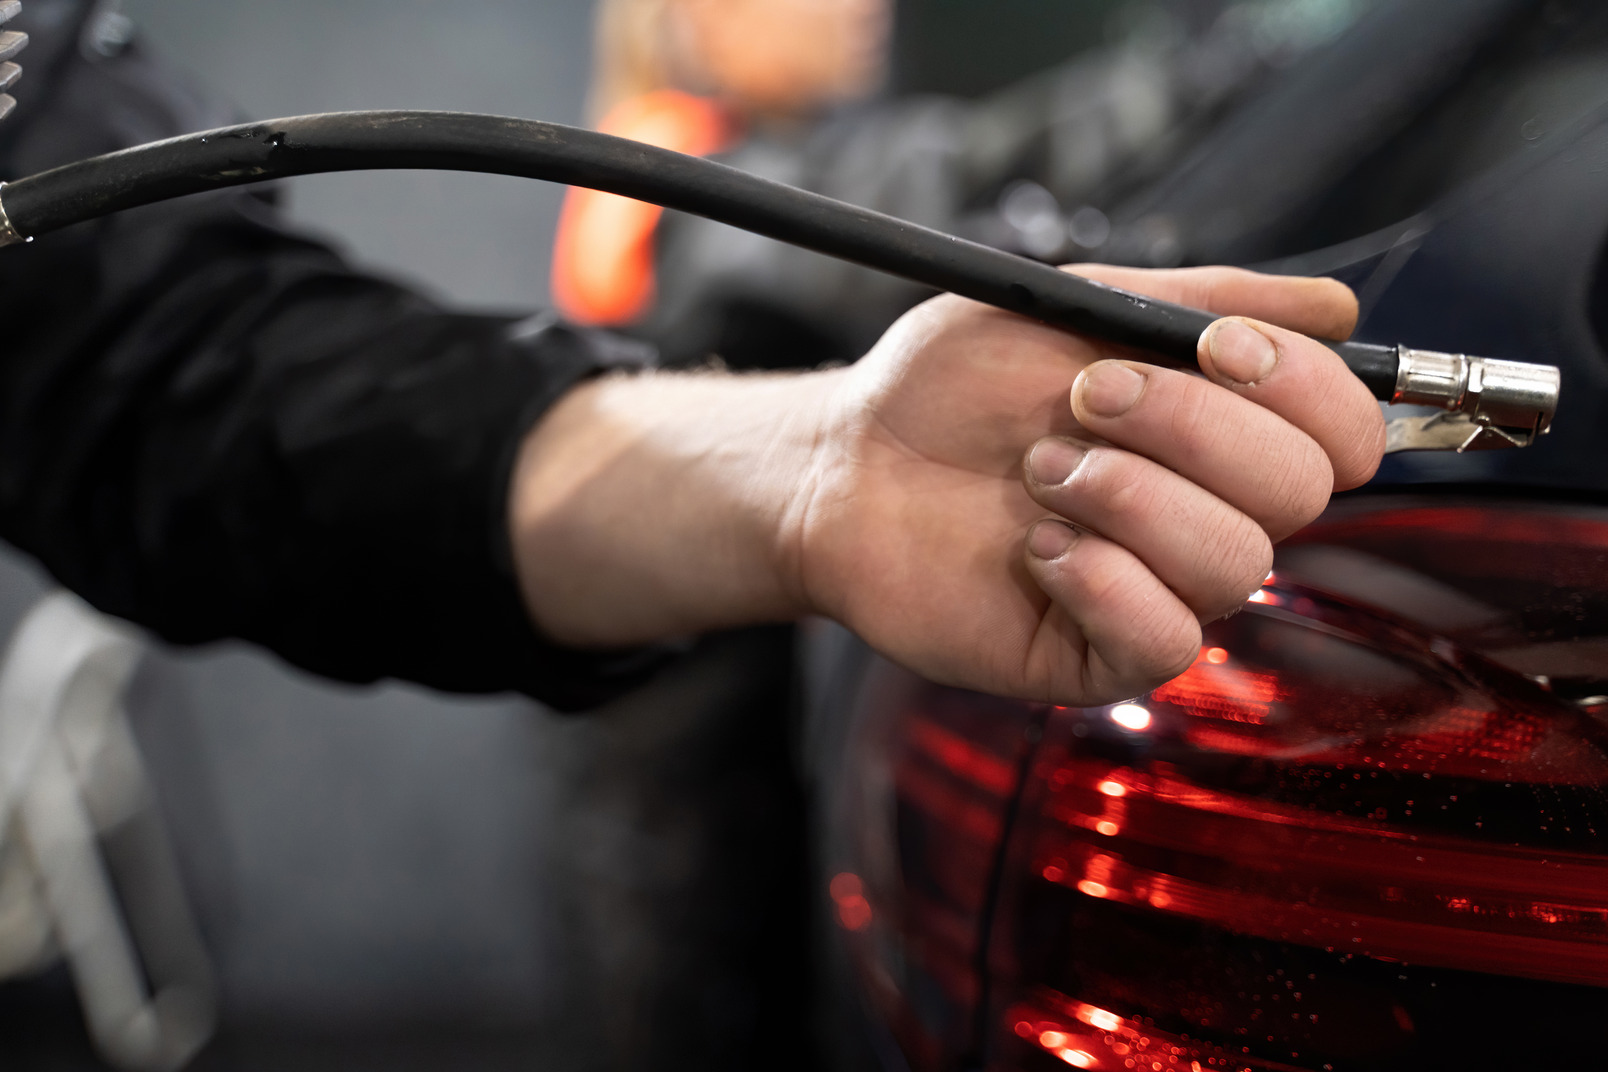 Human hand holding air pump hose